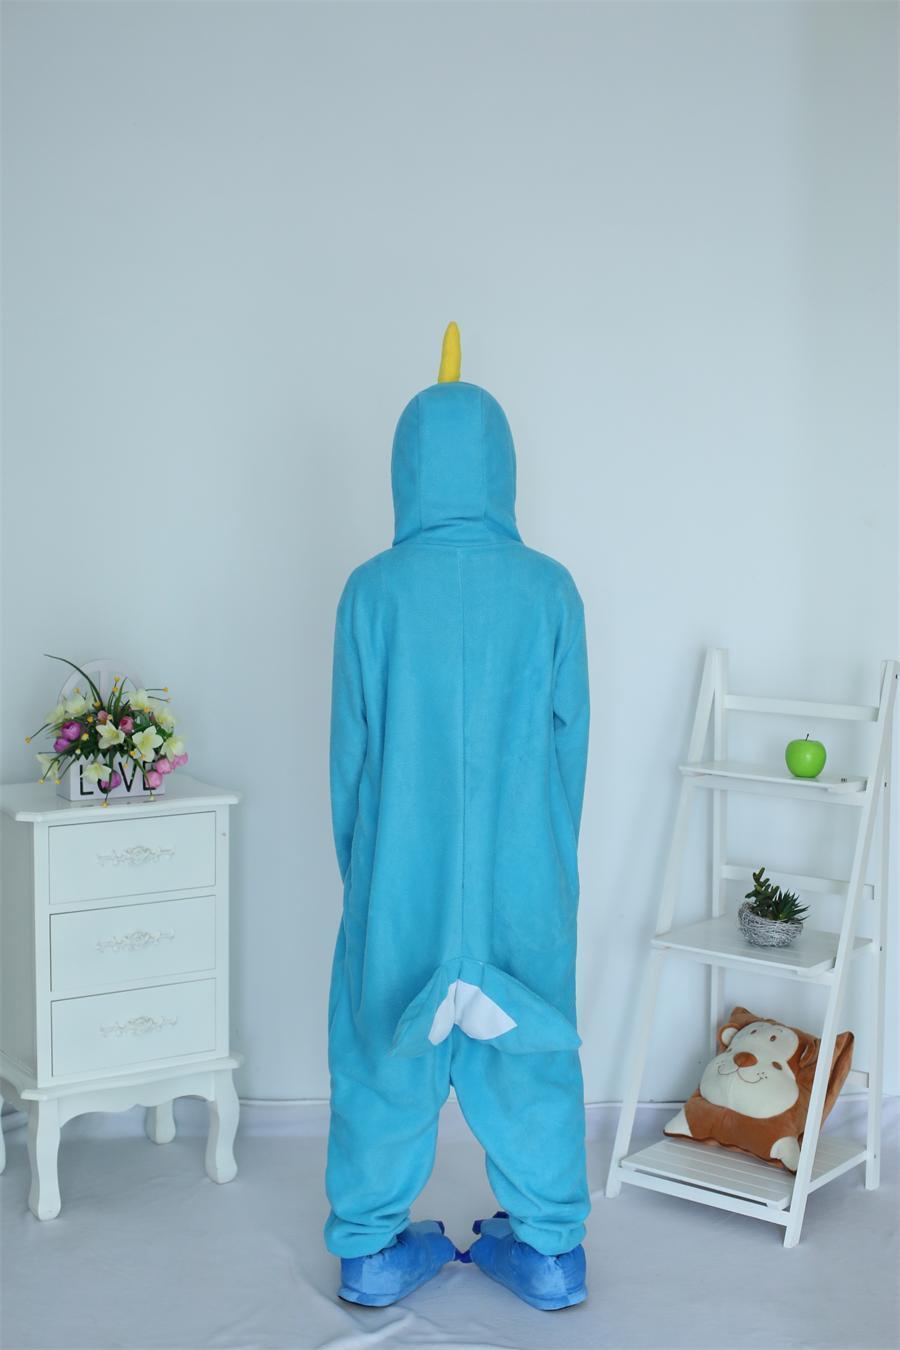 Cartoon Adult Unisex Animal Costume Narwhal Onesie Whale Pajamas Fleece Sheep Pajamas Animal Costumes Cosplay Sleepwear